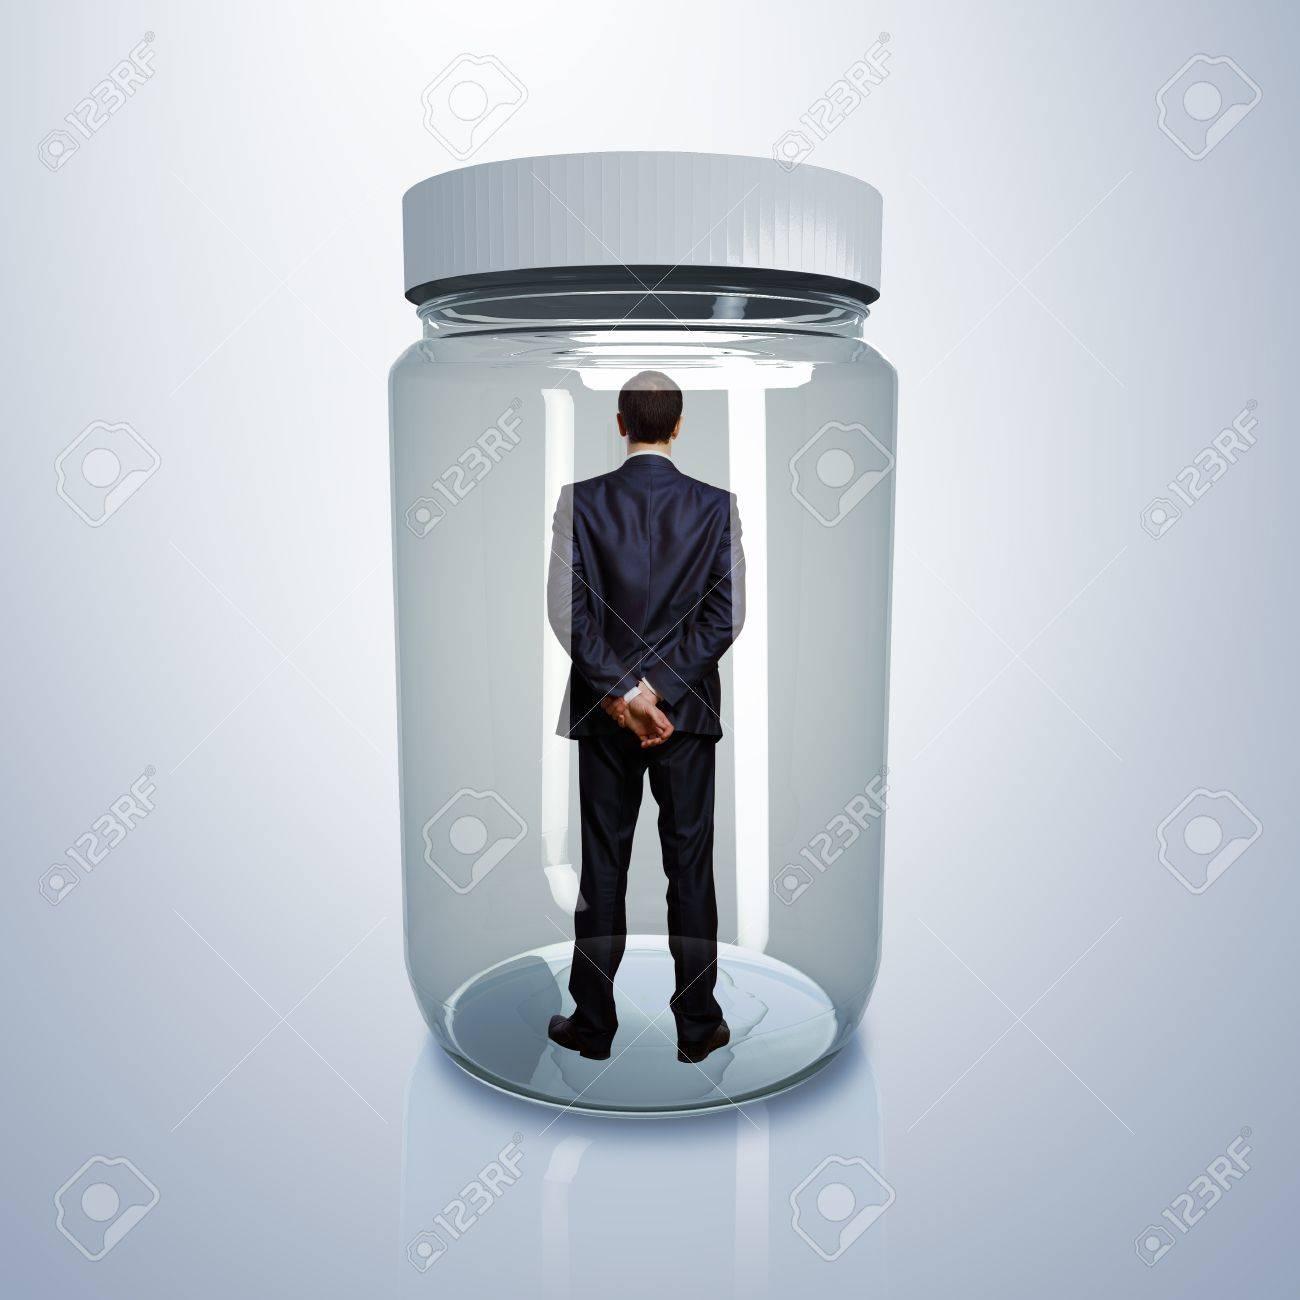 15207512-Businessman-trapped-inside-a-transparent-glass-jar-Stock-Photo.jpg